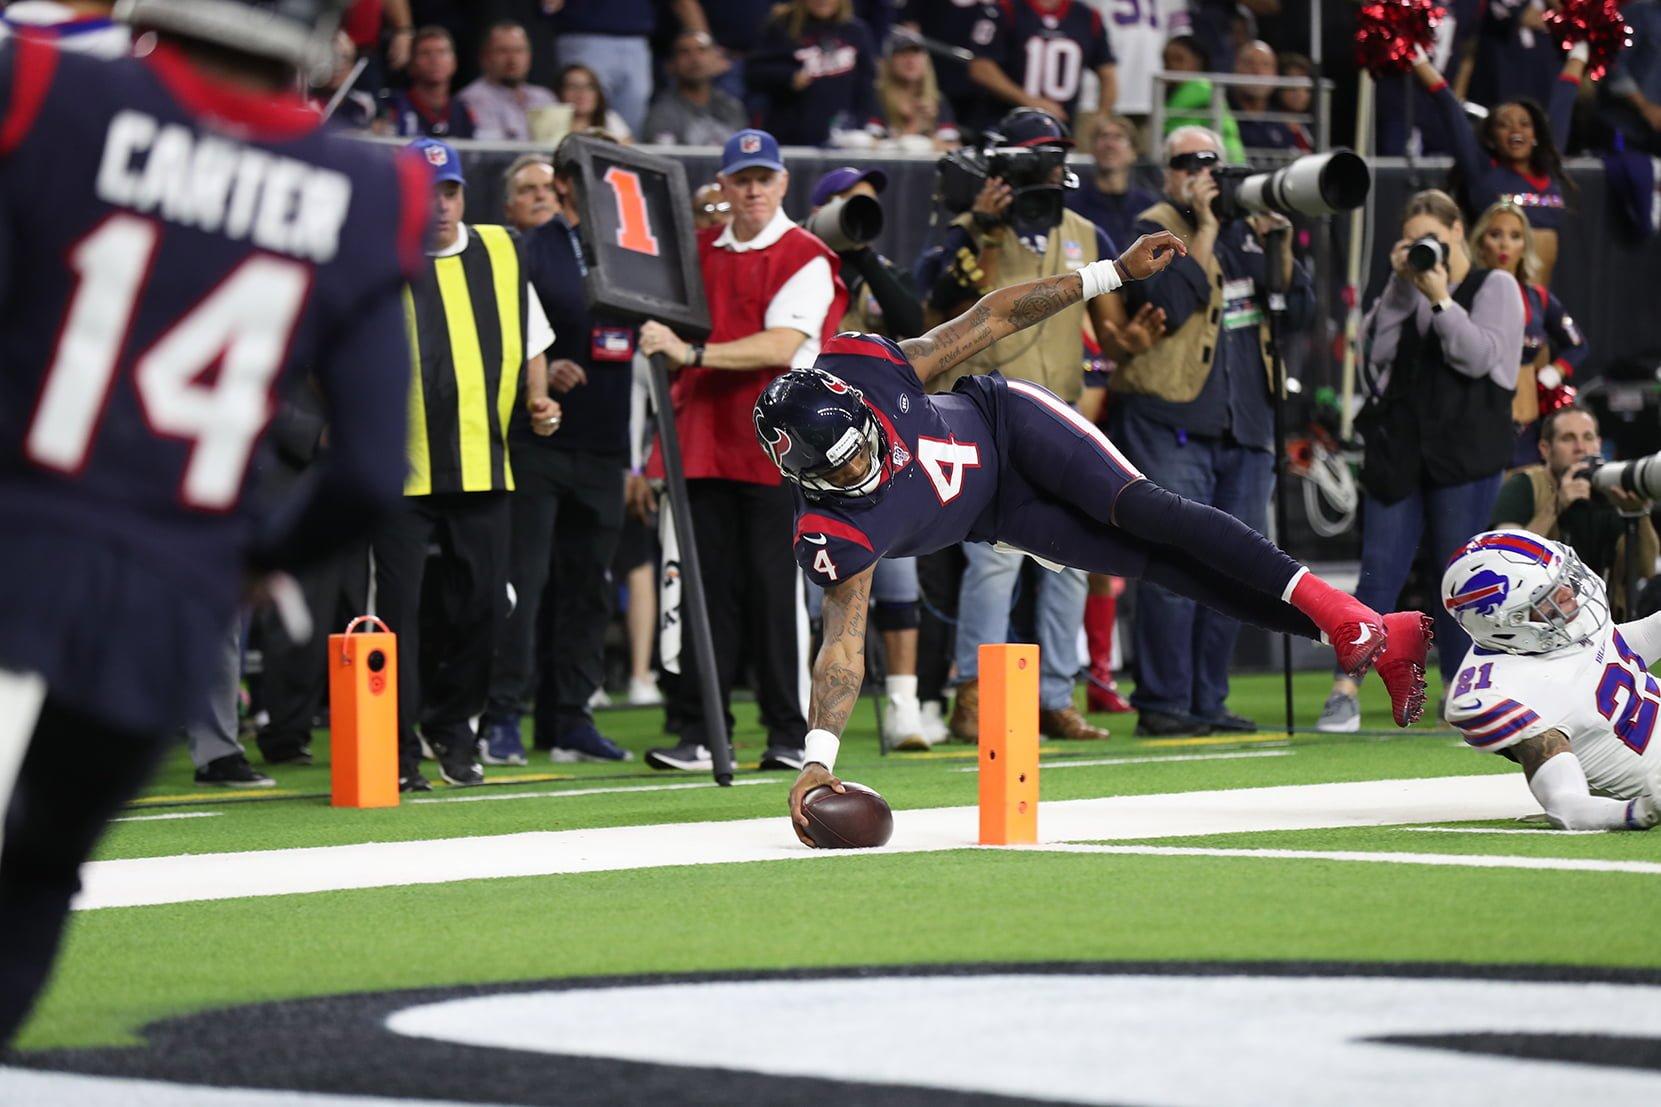 Bills Texans Ratings Hit Six Year High Sports Media Watch